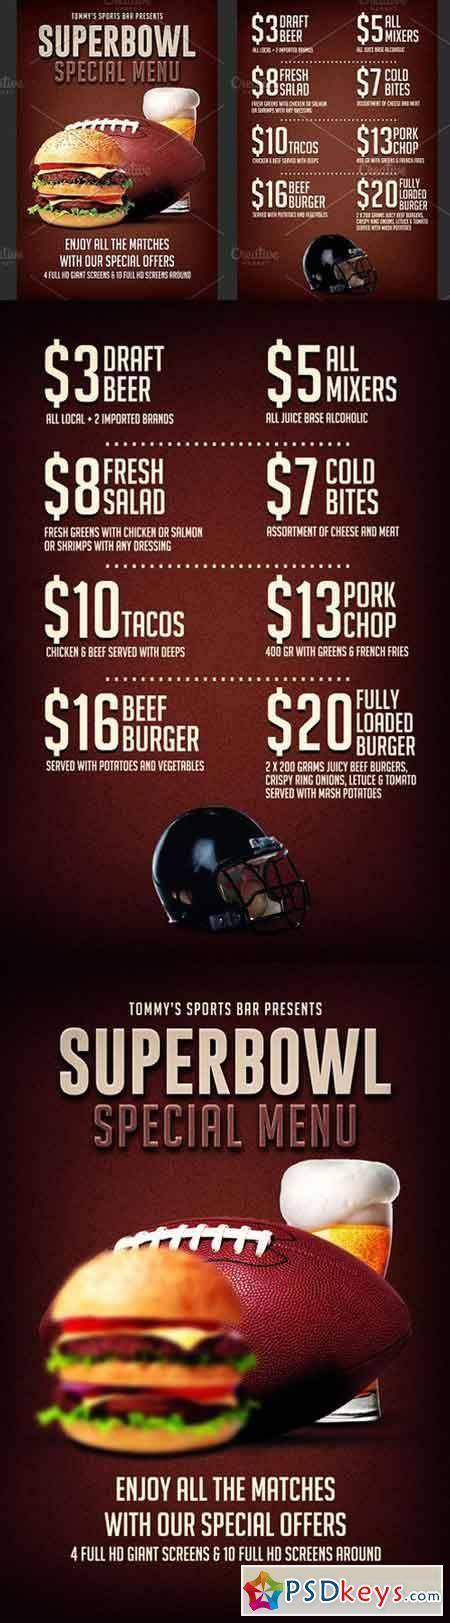 football super bowl food menu flyer 1213258 187 free